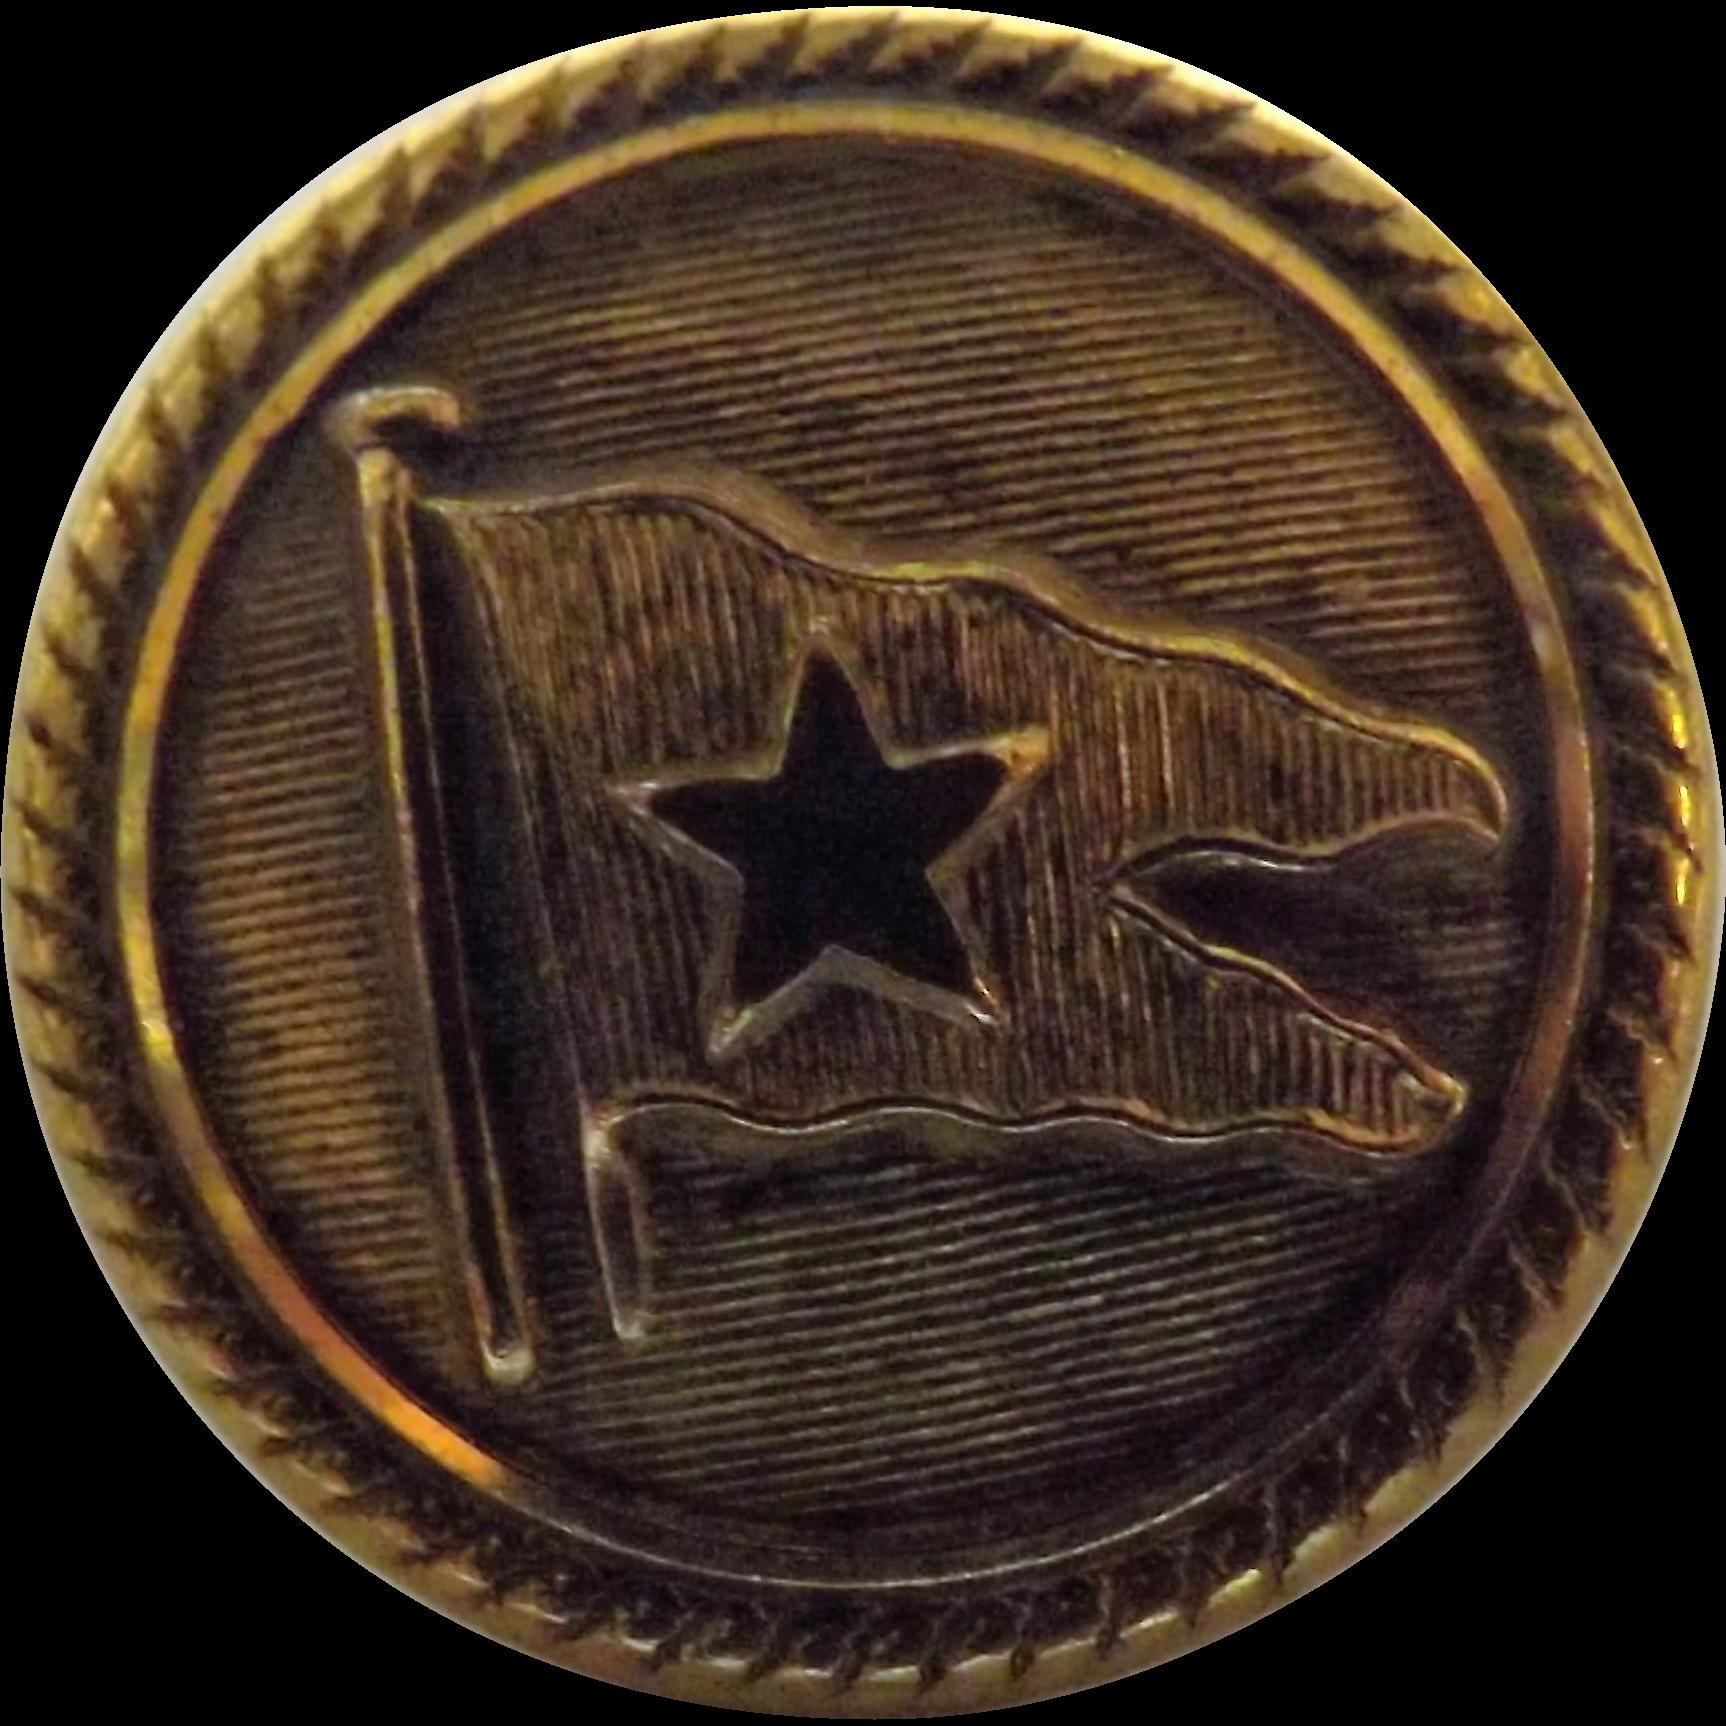 White Star Line Gilt Brass Button - Miller & Son Southampton